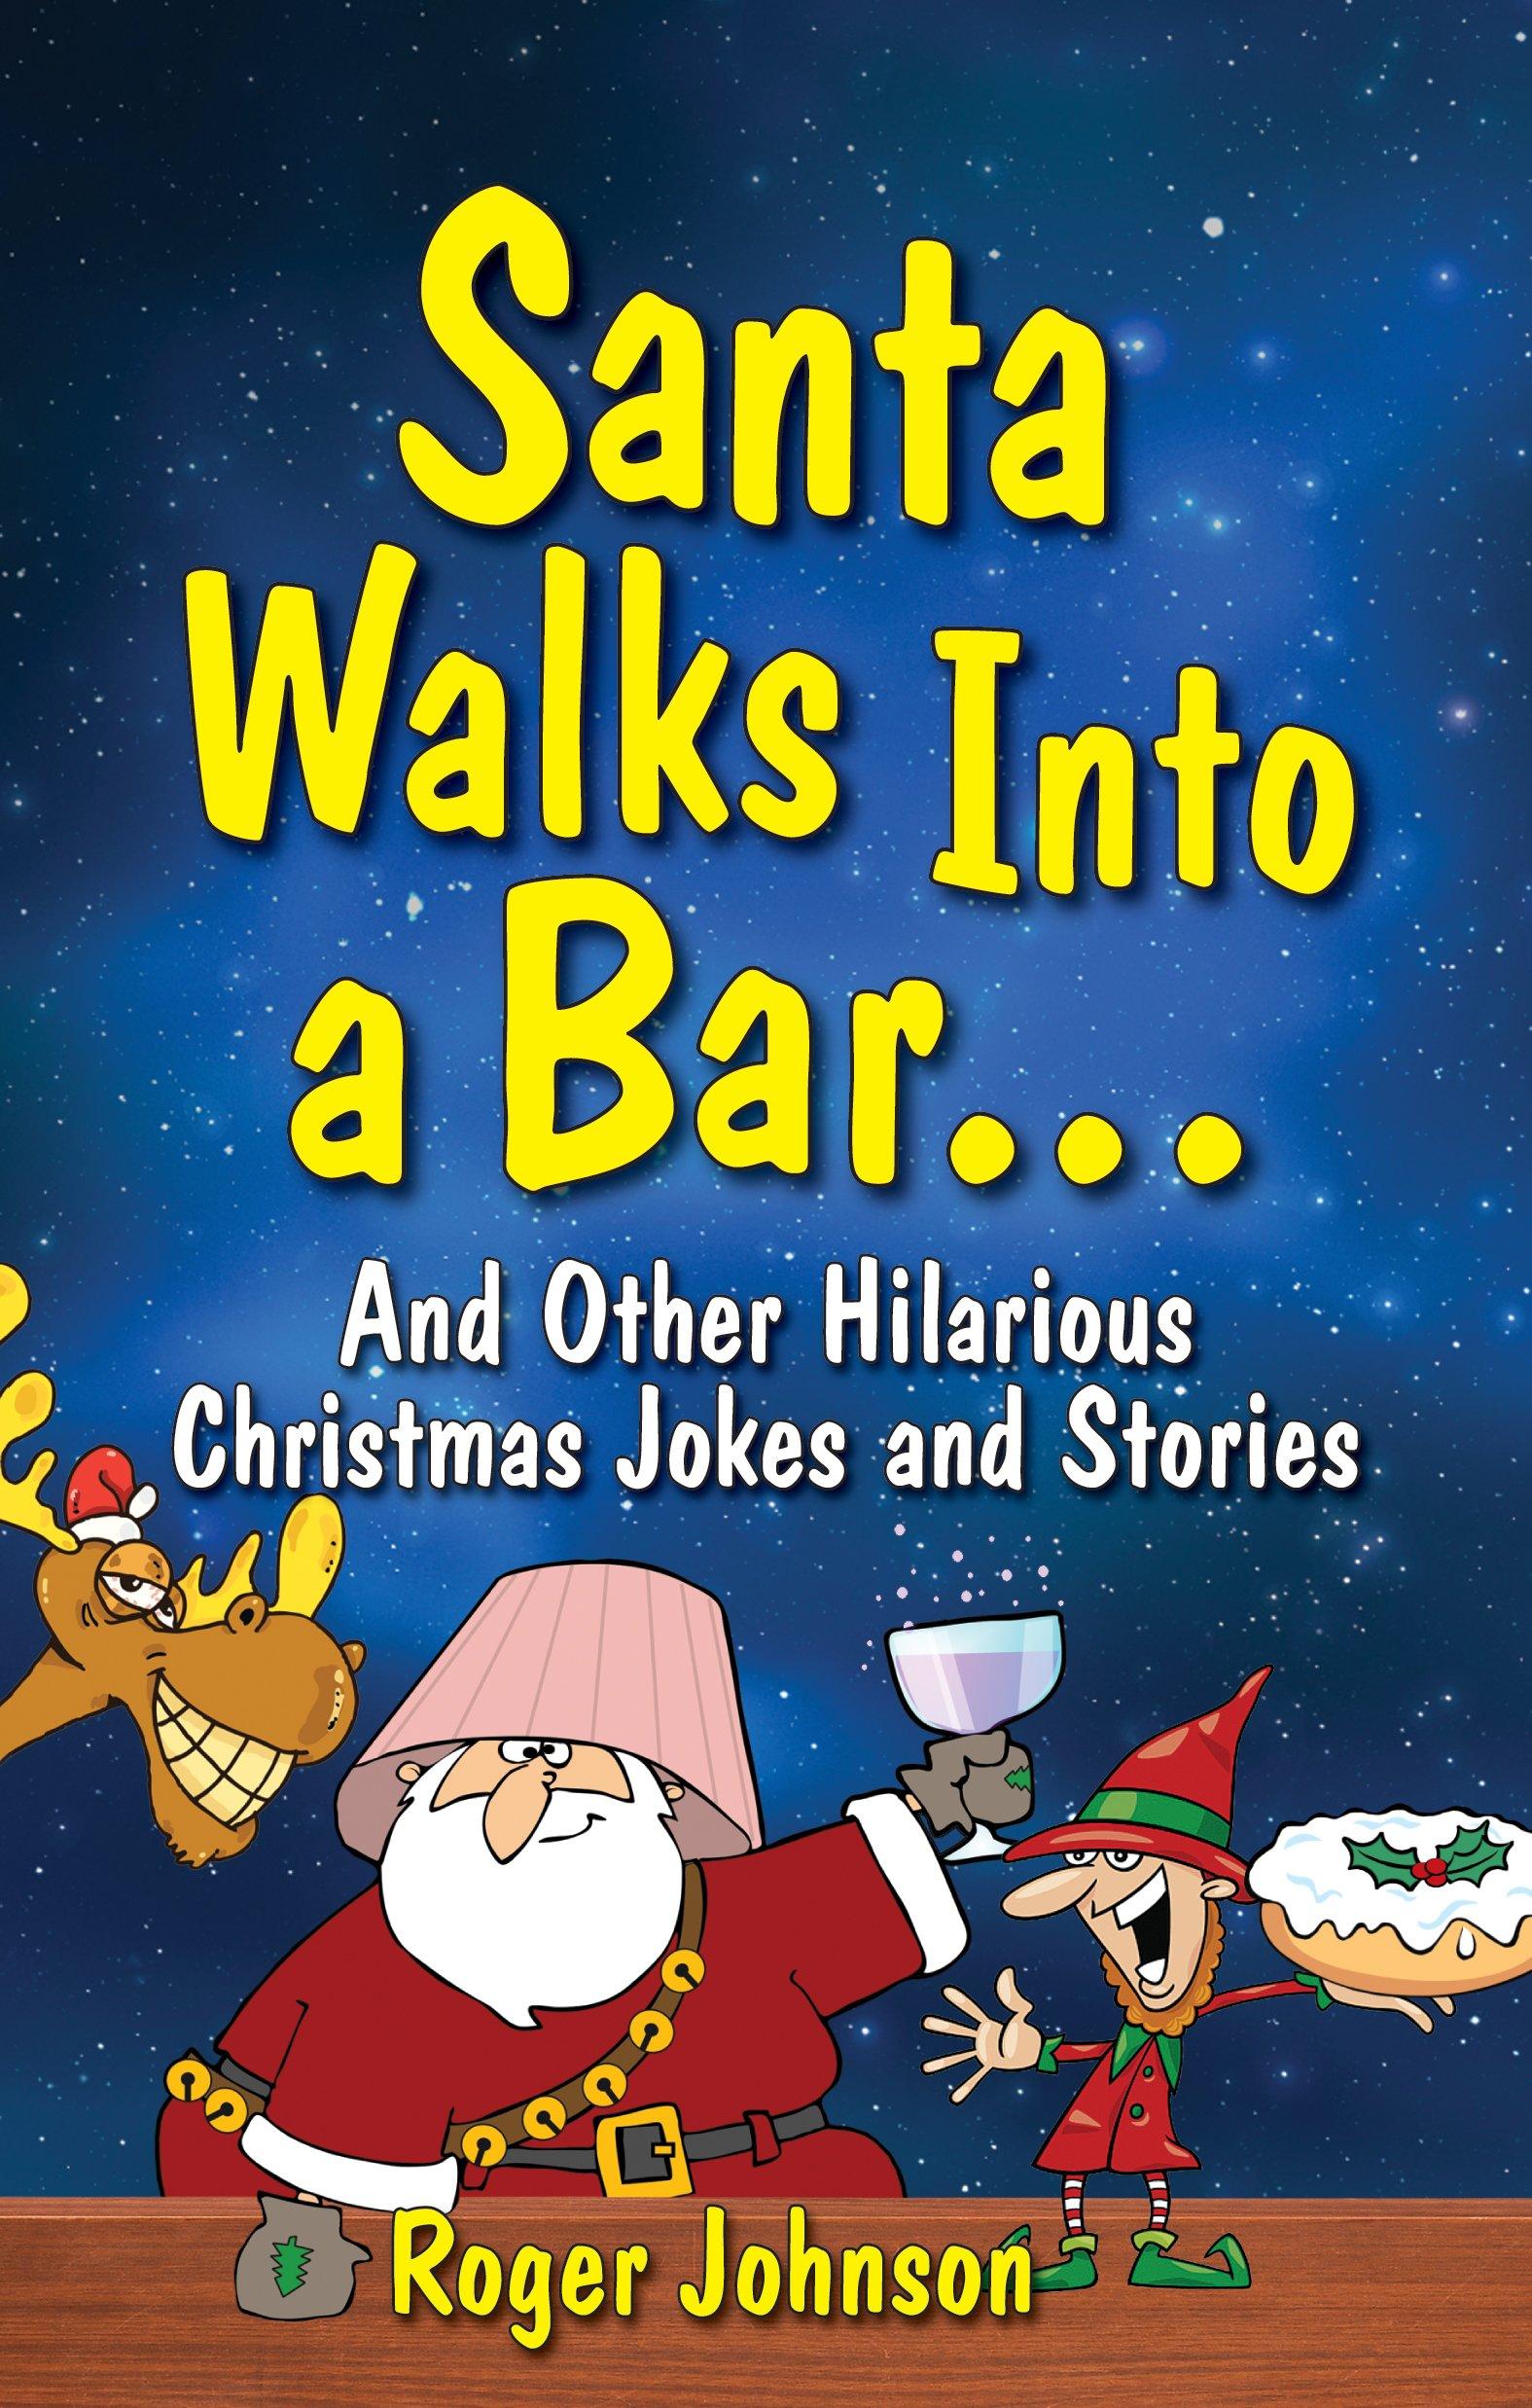 Bad Christmas Jokes.Santa Walks Into A Bar Christmas Jokes With An Edge David